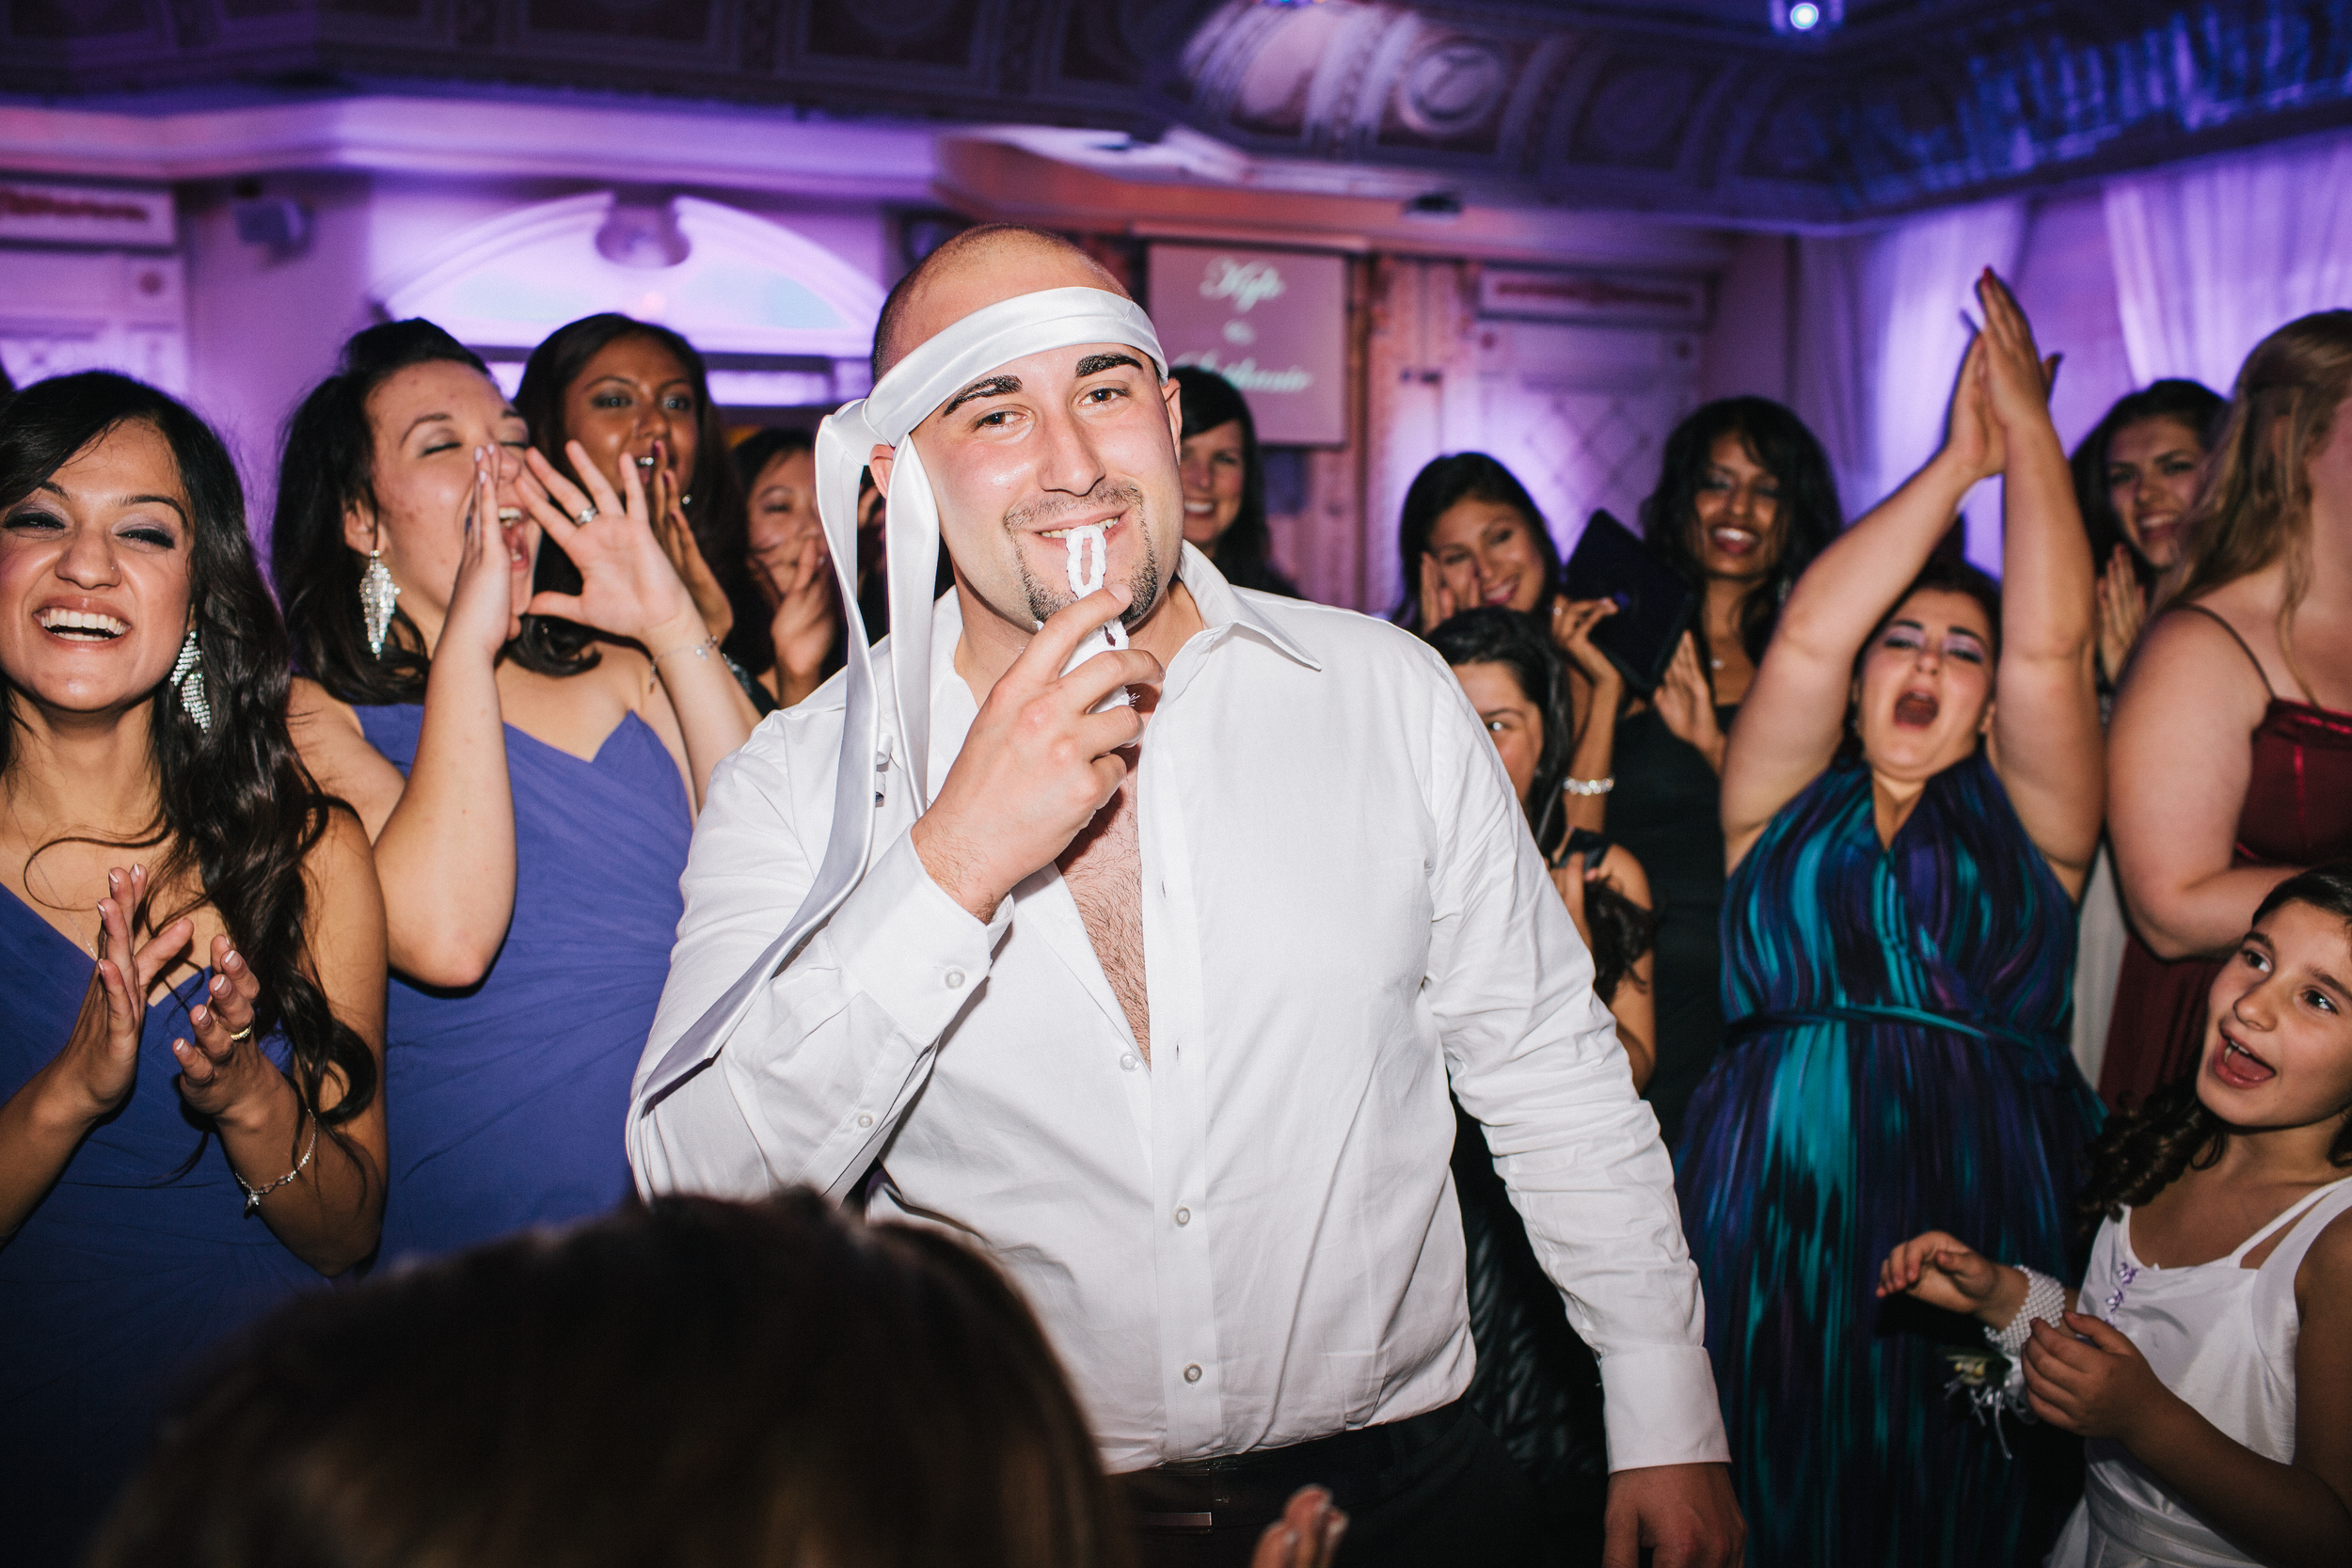 Stephanie-Kyle-paradise-banquet-hall-michael-rousseau-photography-best-toronto-wedding-photographer-documentary-wedding056.JPG